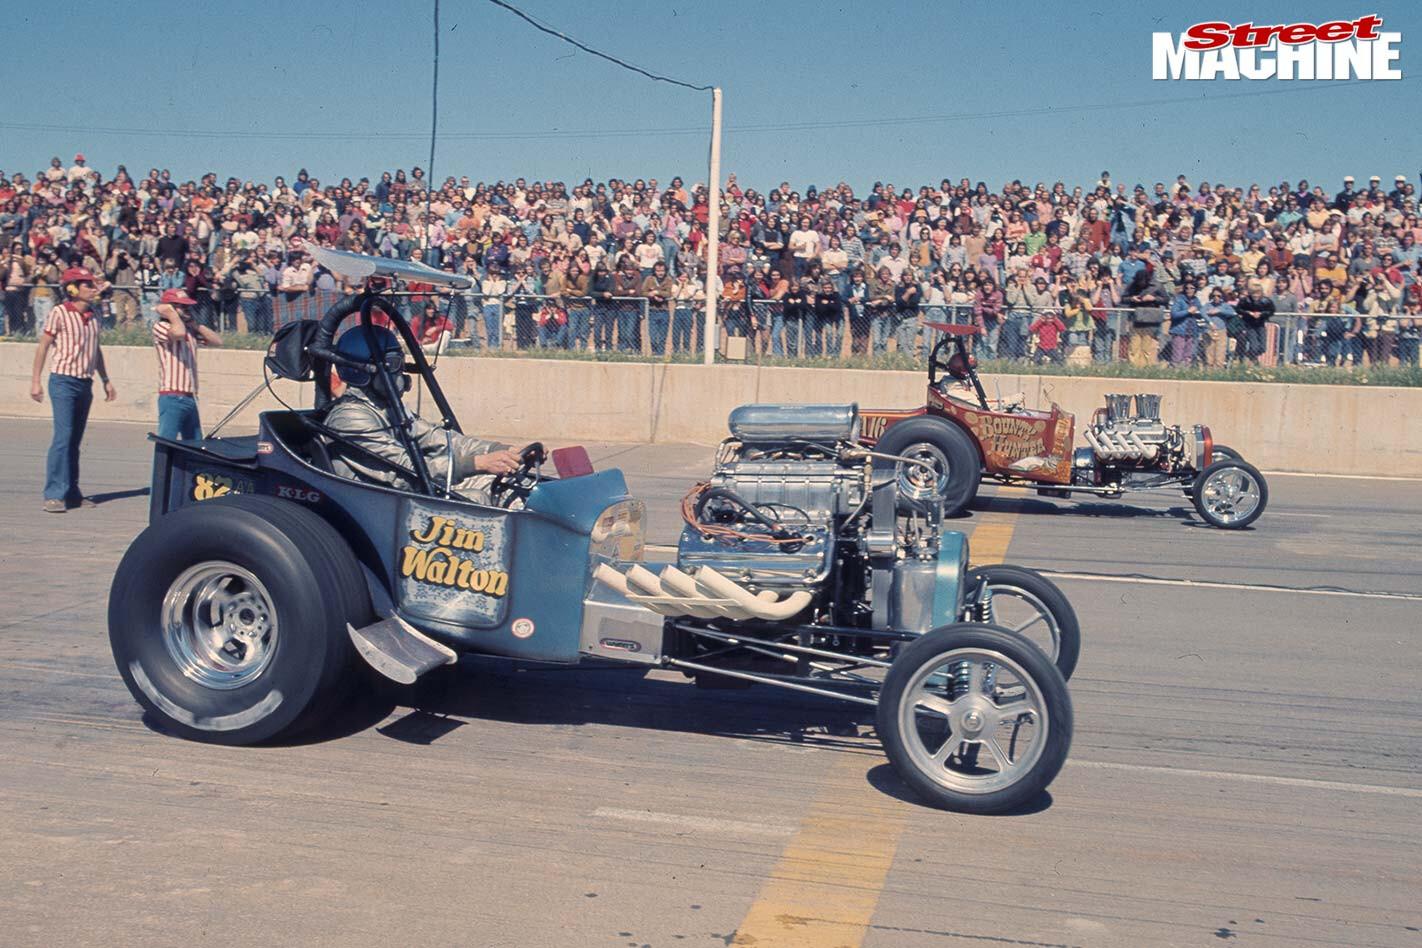 aussie drag racer Jim Wilton